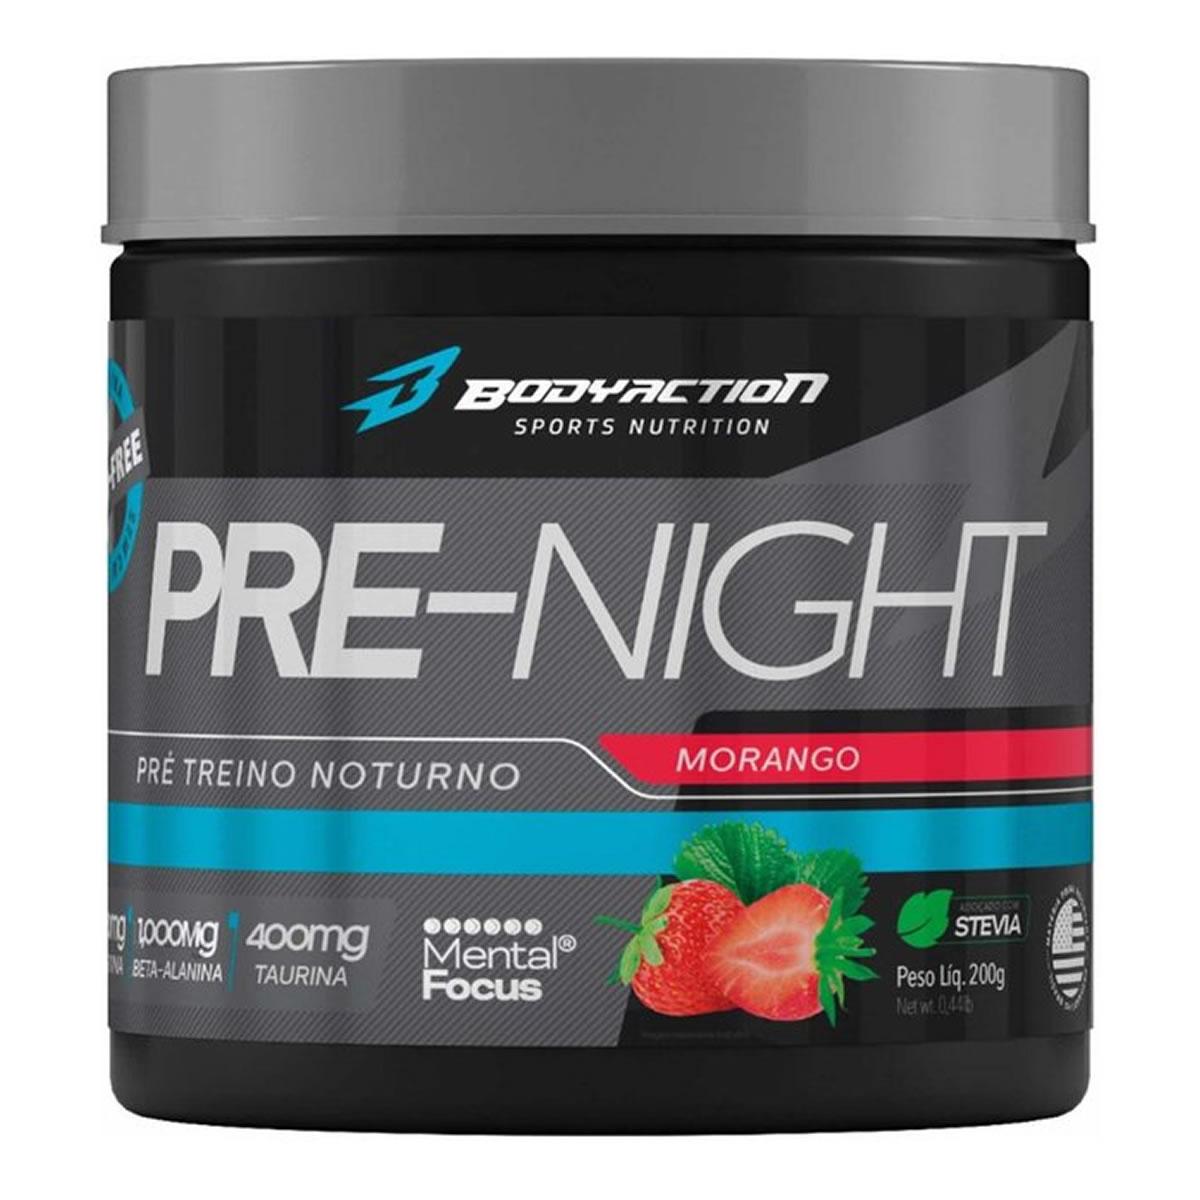 Pré-Night 200g - Body Action